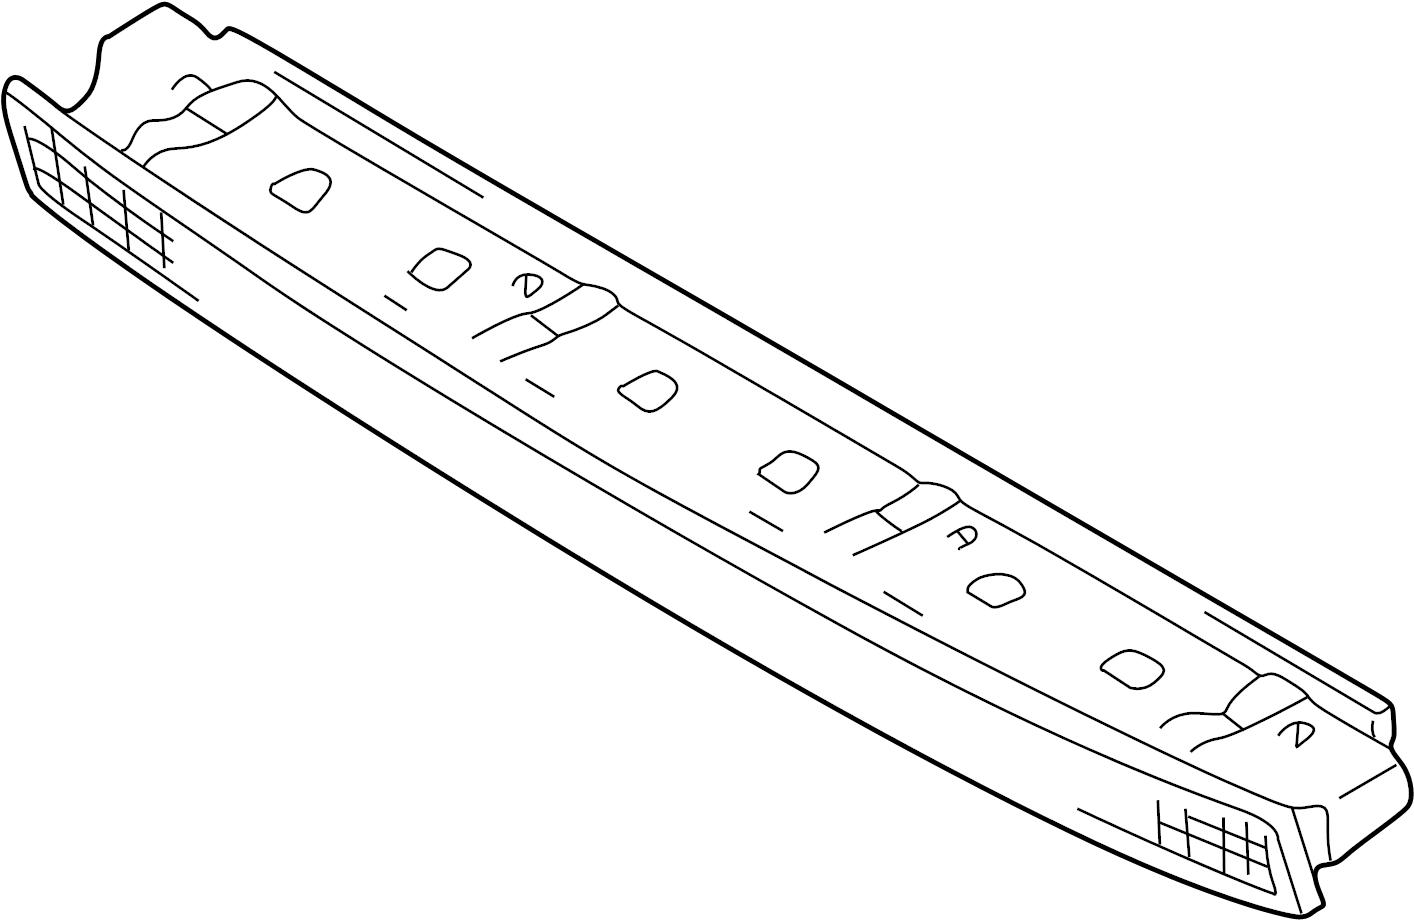 Audi S4 Stop Lamp Mount High Brakelight Center Light Lens And Amplifier